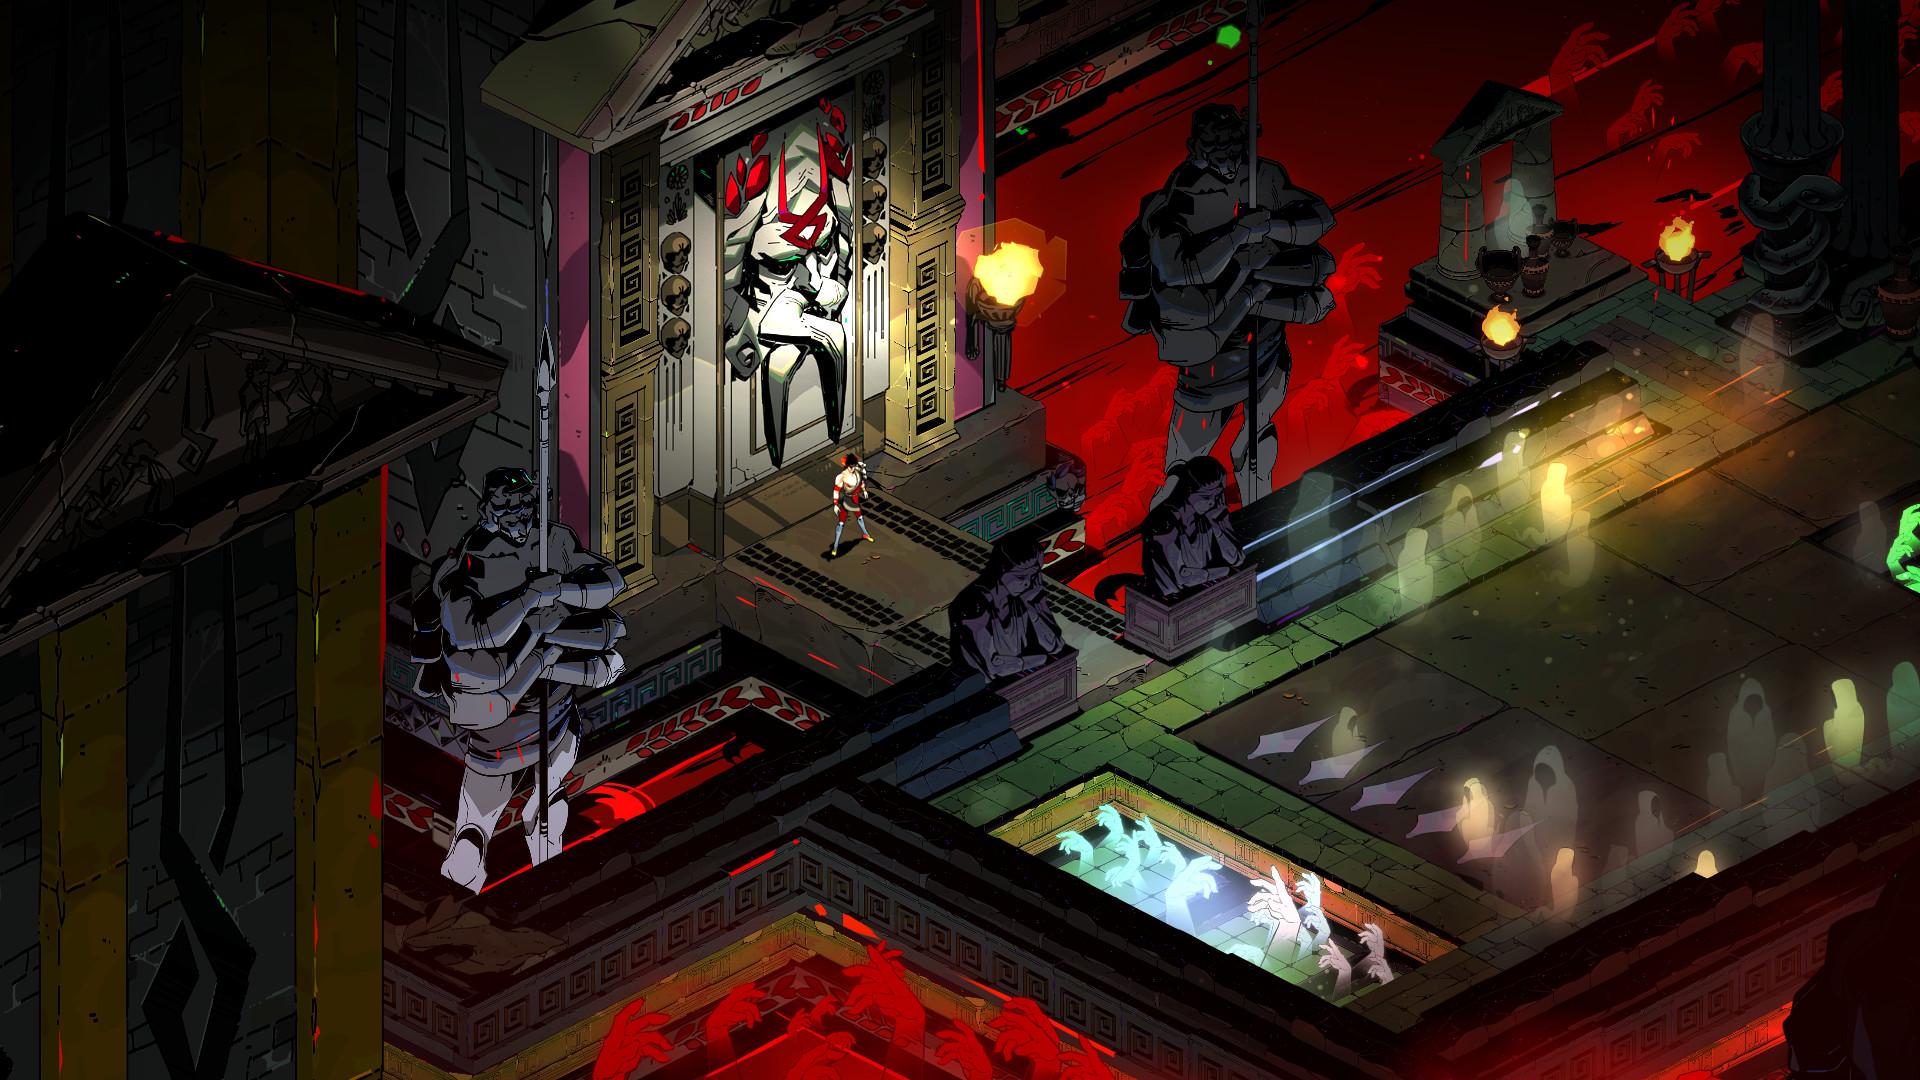 Hades' 1.0 patch unlocks the true ending screenshot